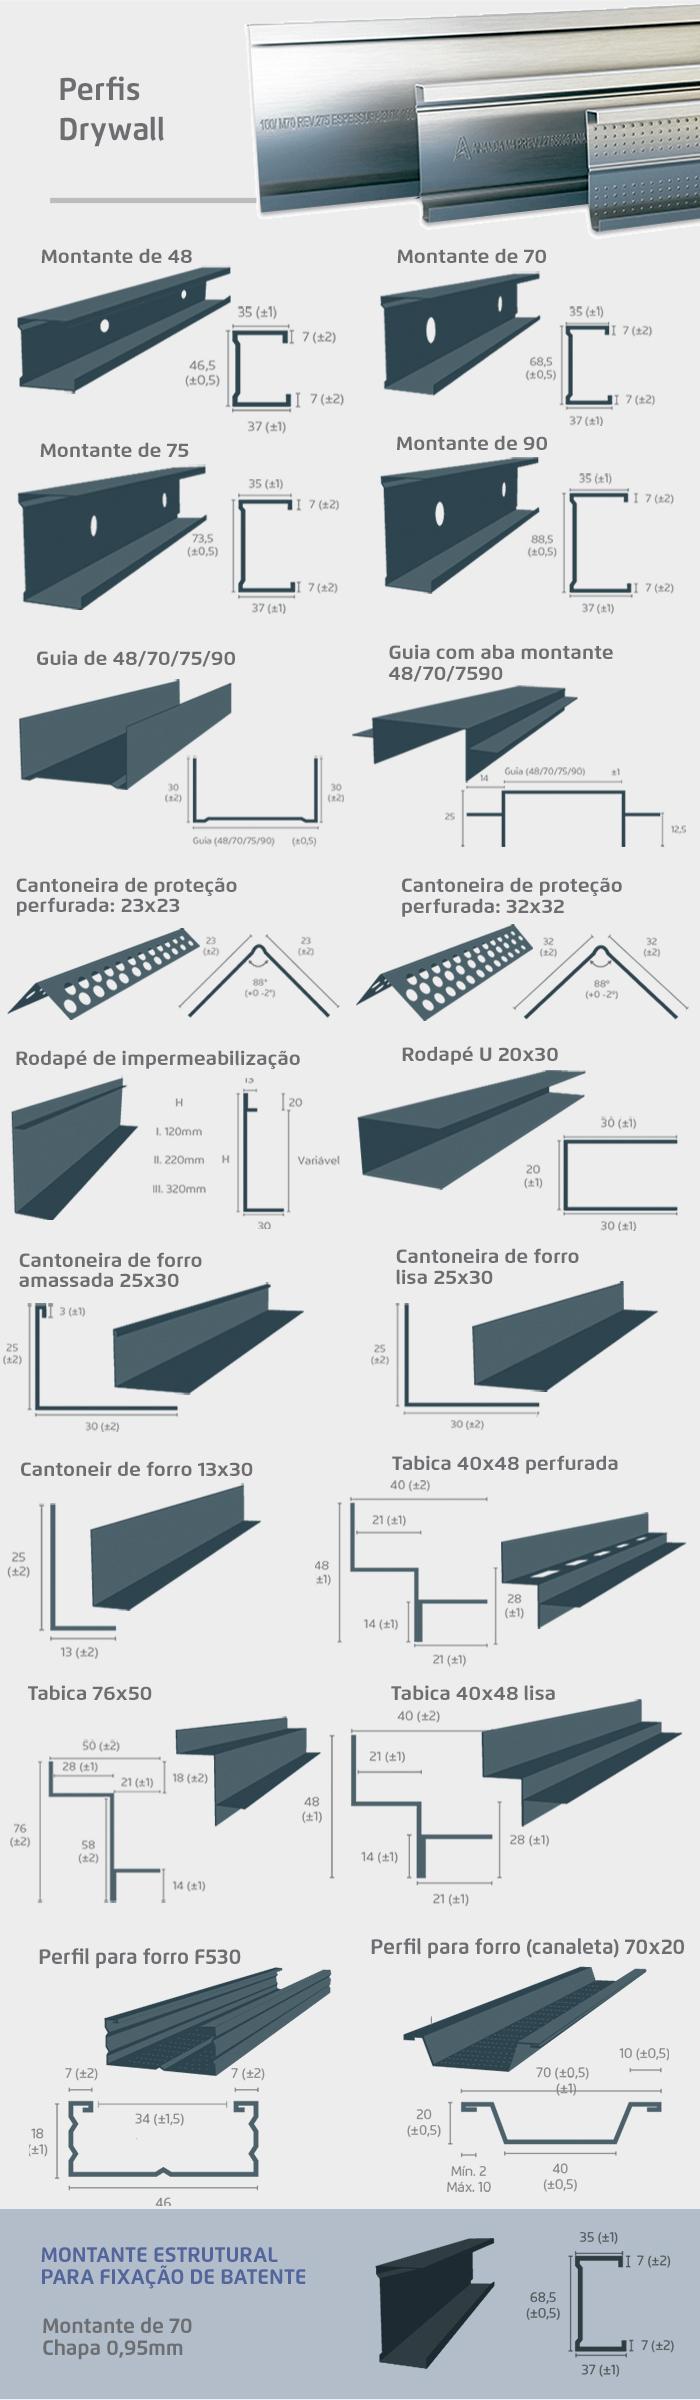 Perfis-Drywall2